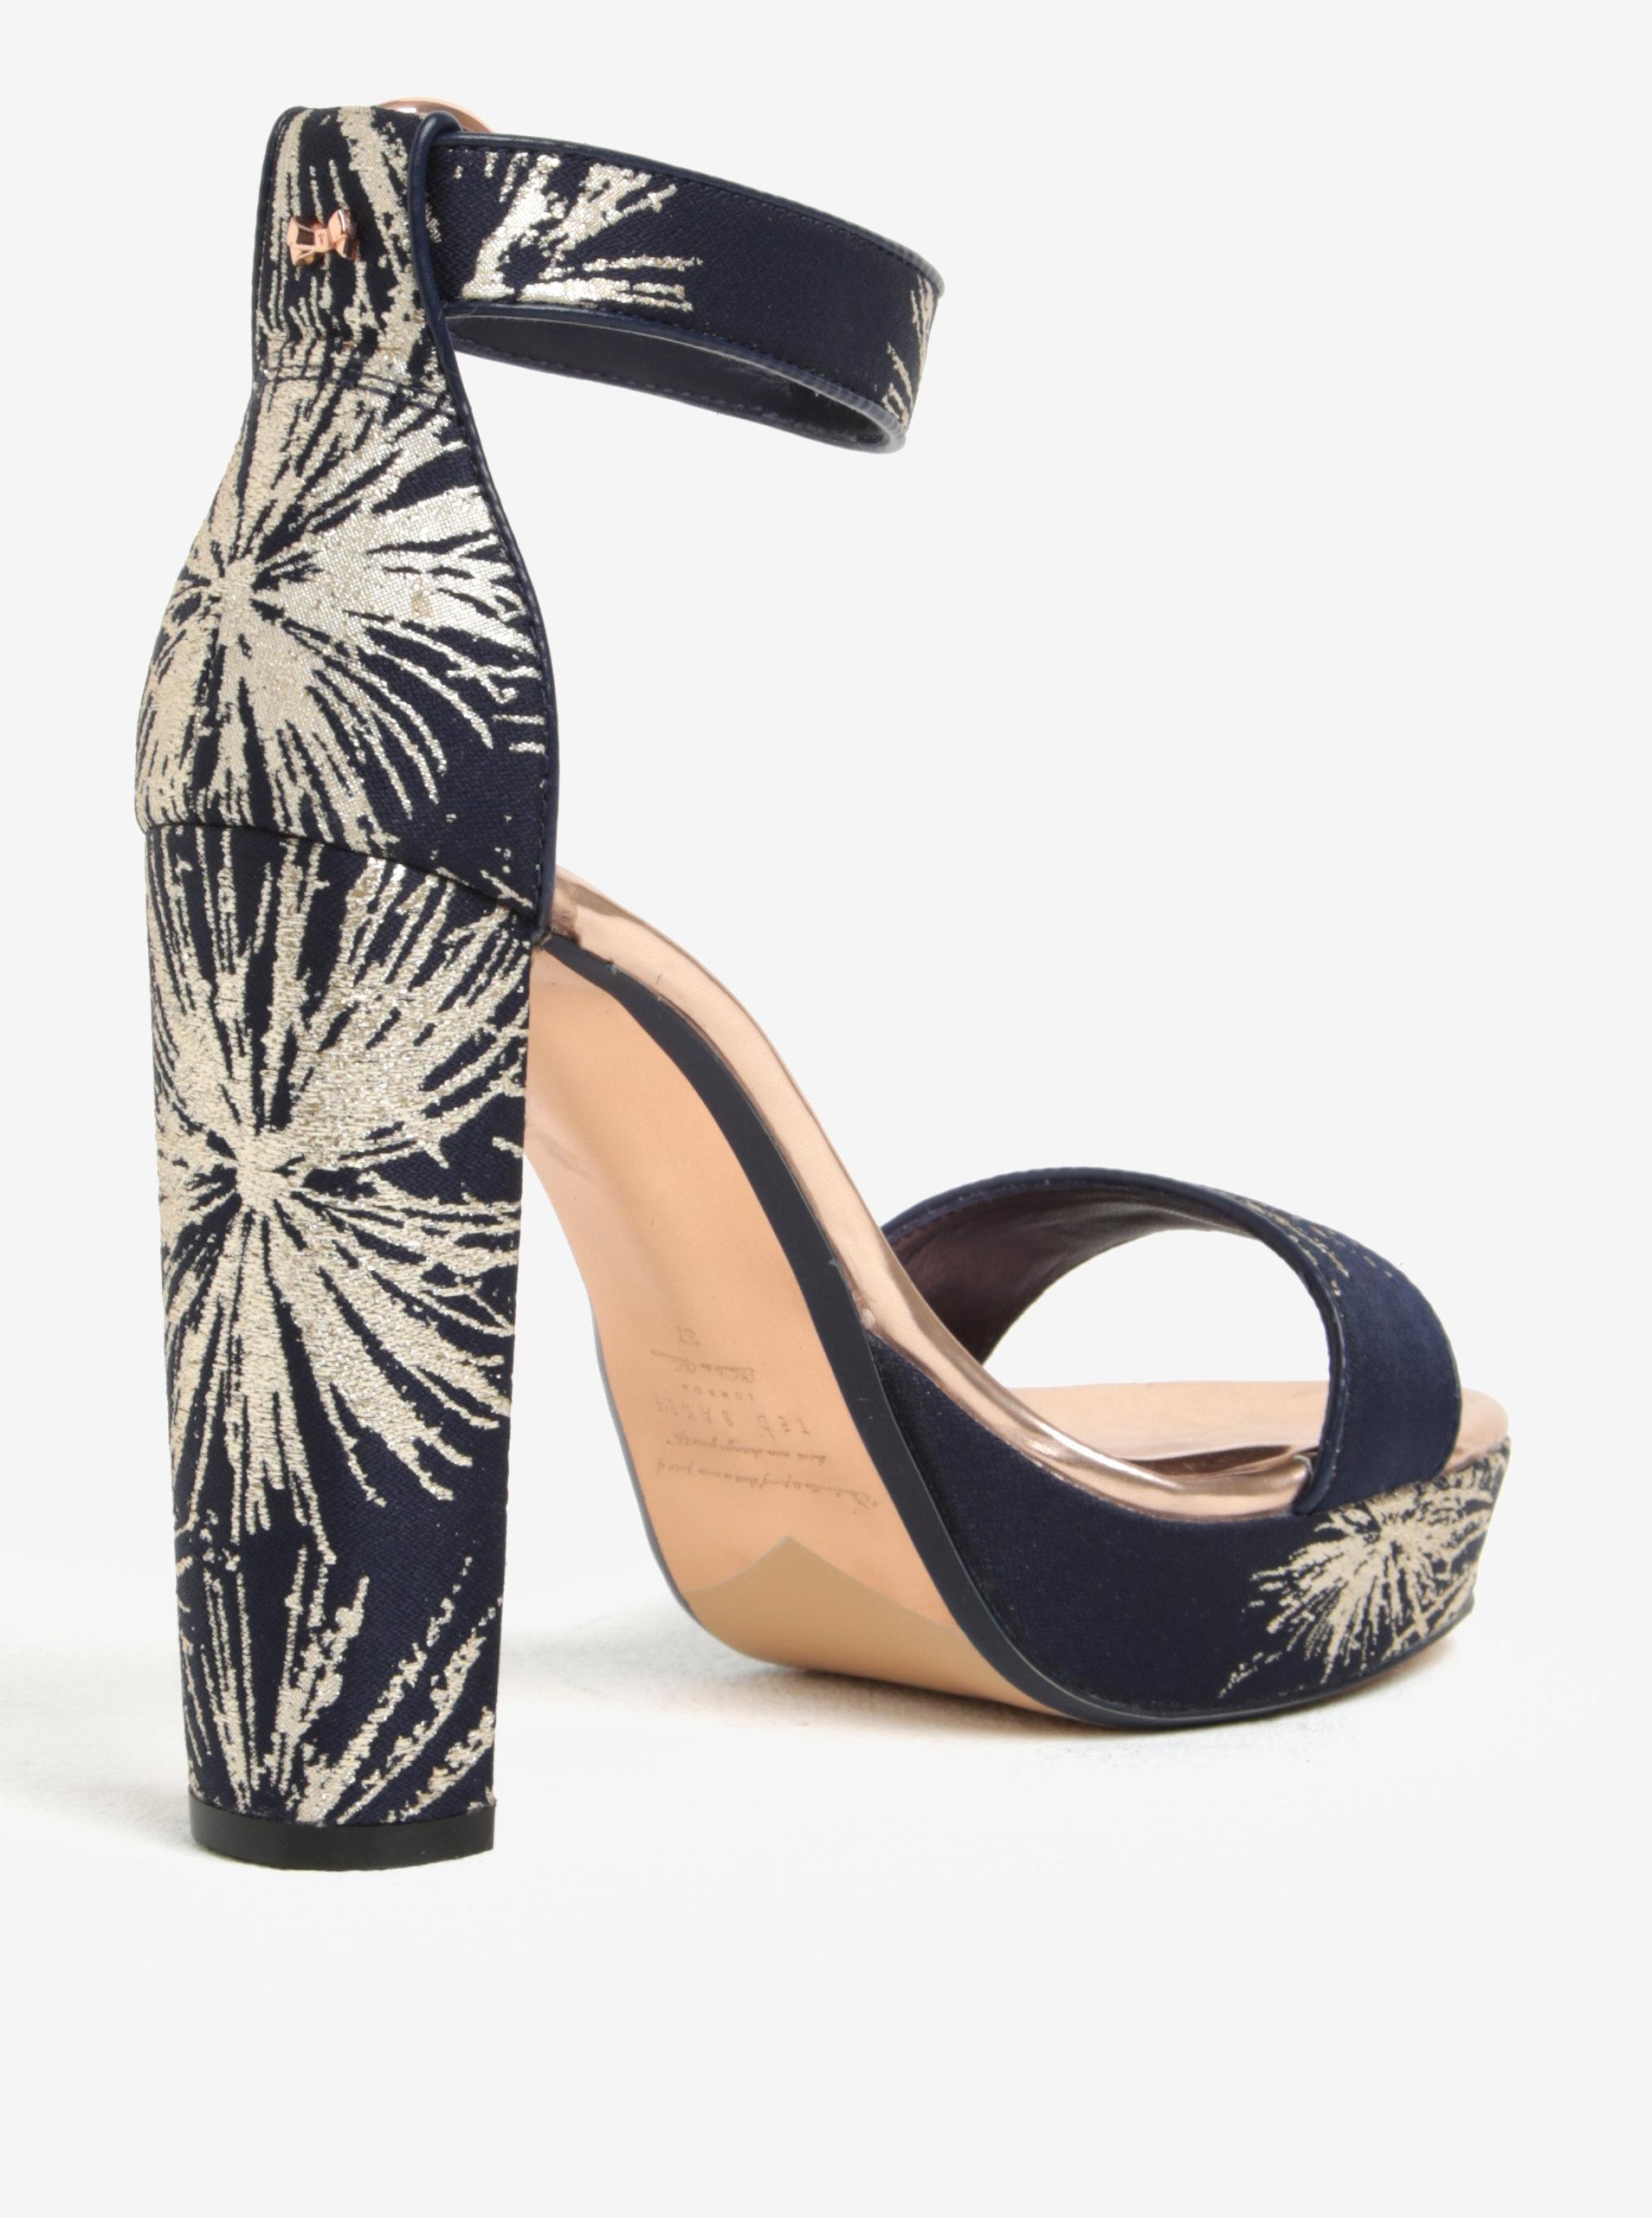 398ee36783563 Zlato-modré vzorované sandálky na platforme Ted Baker Jewll | ZOOT.sk